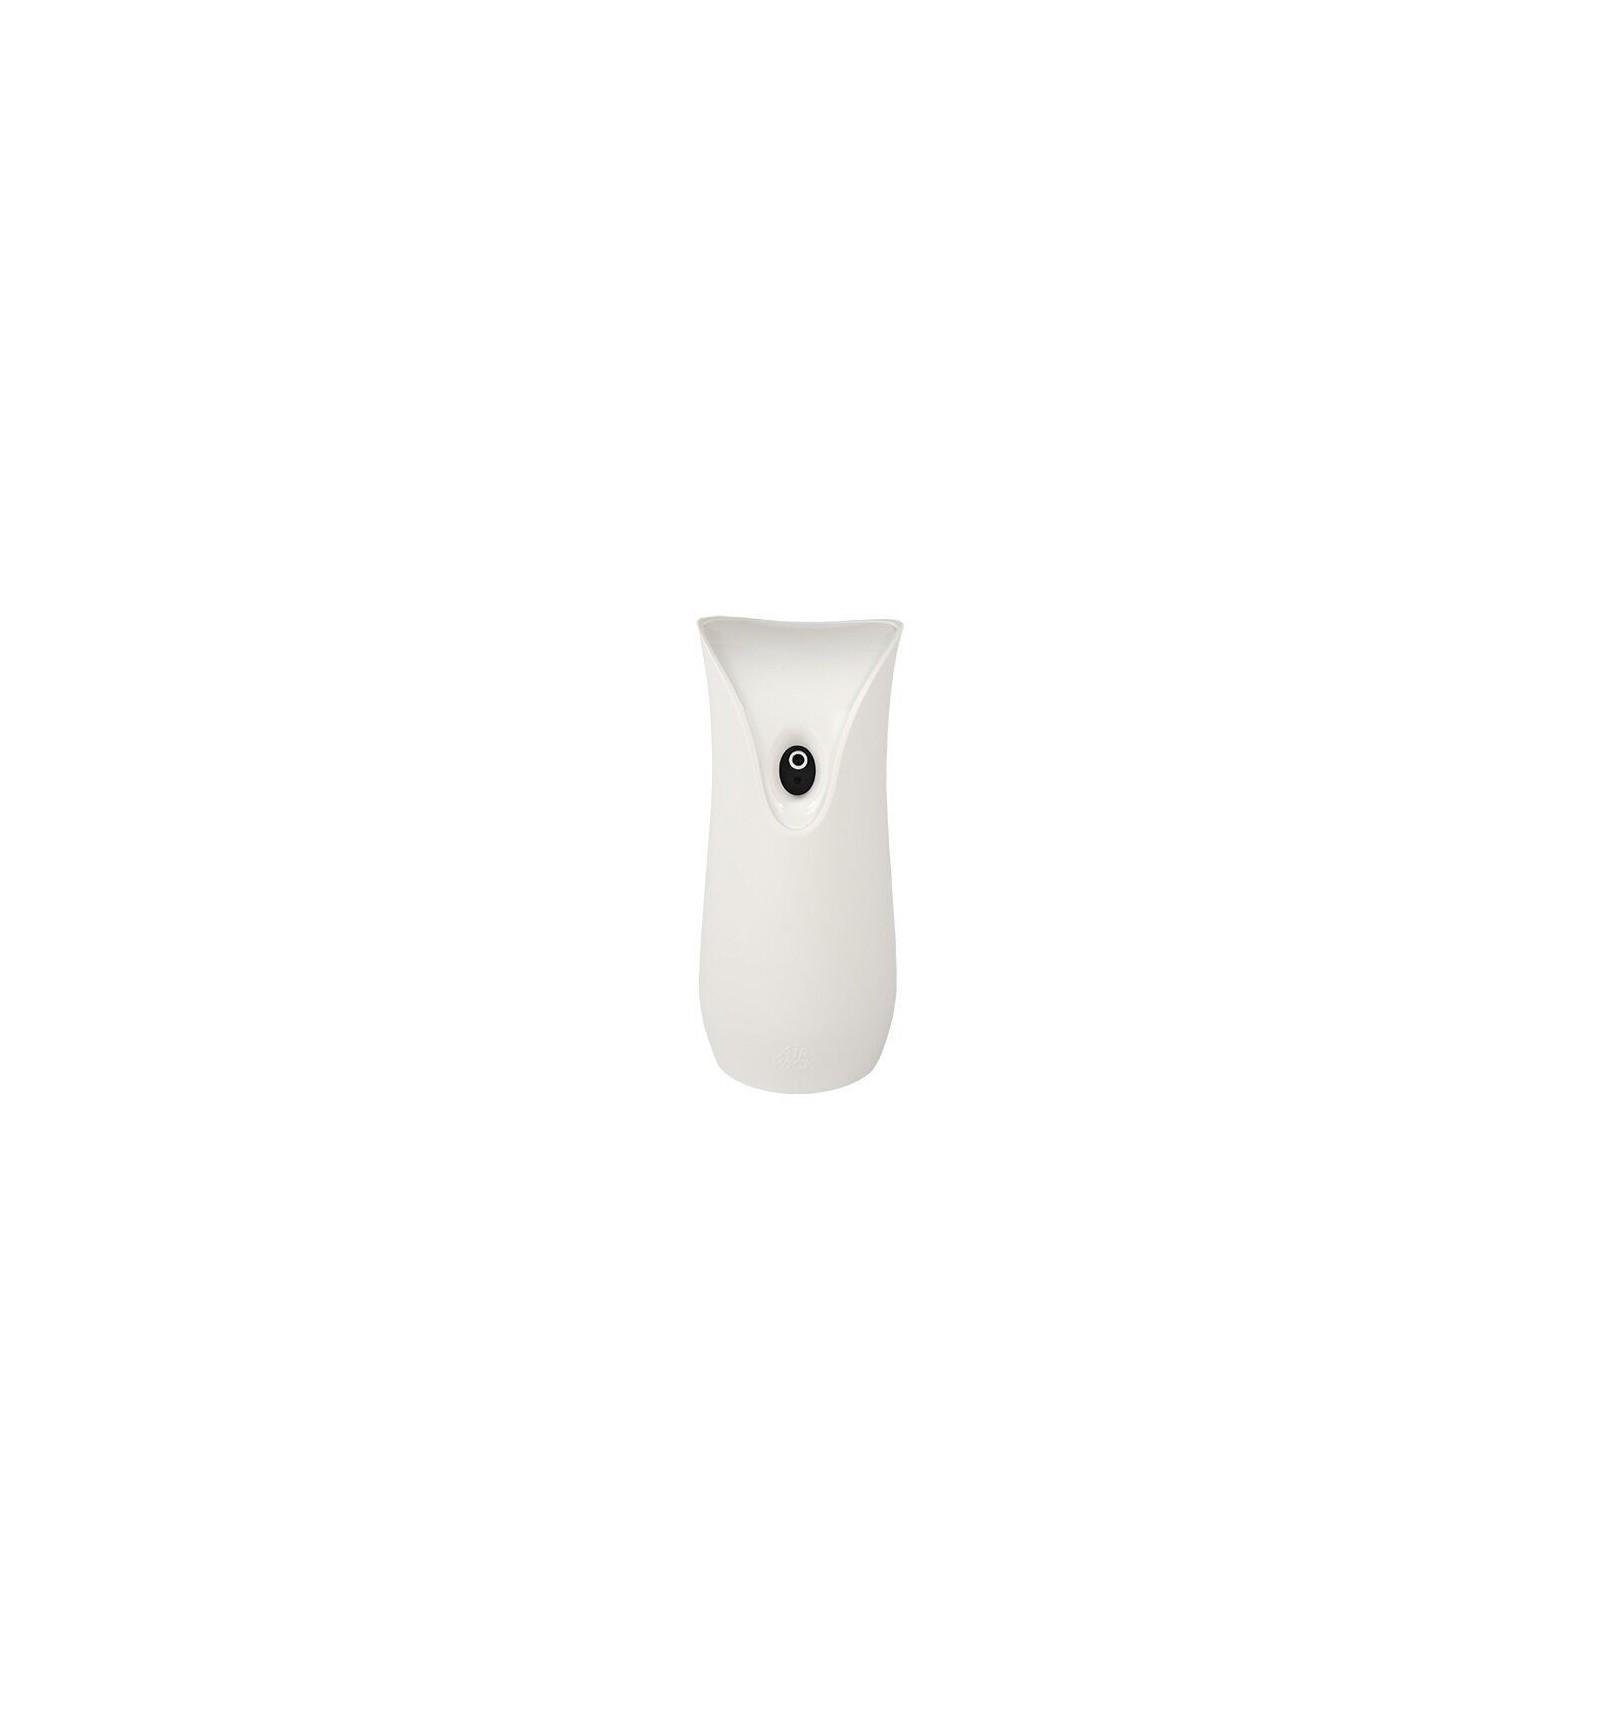 Air Freshener Color Hidden Spy Camera Nanny Cam with DVR - FingerEze